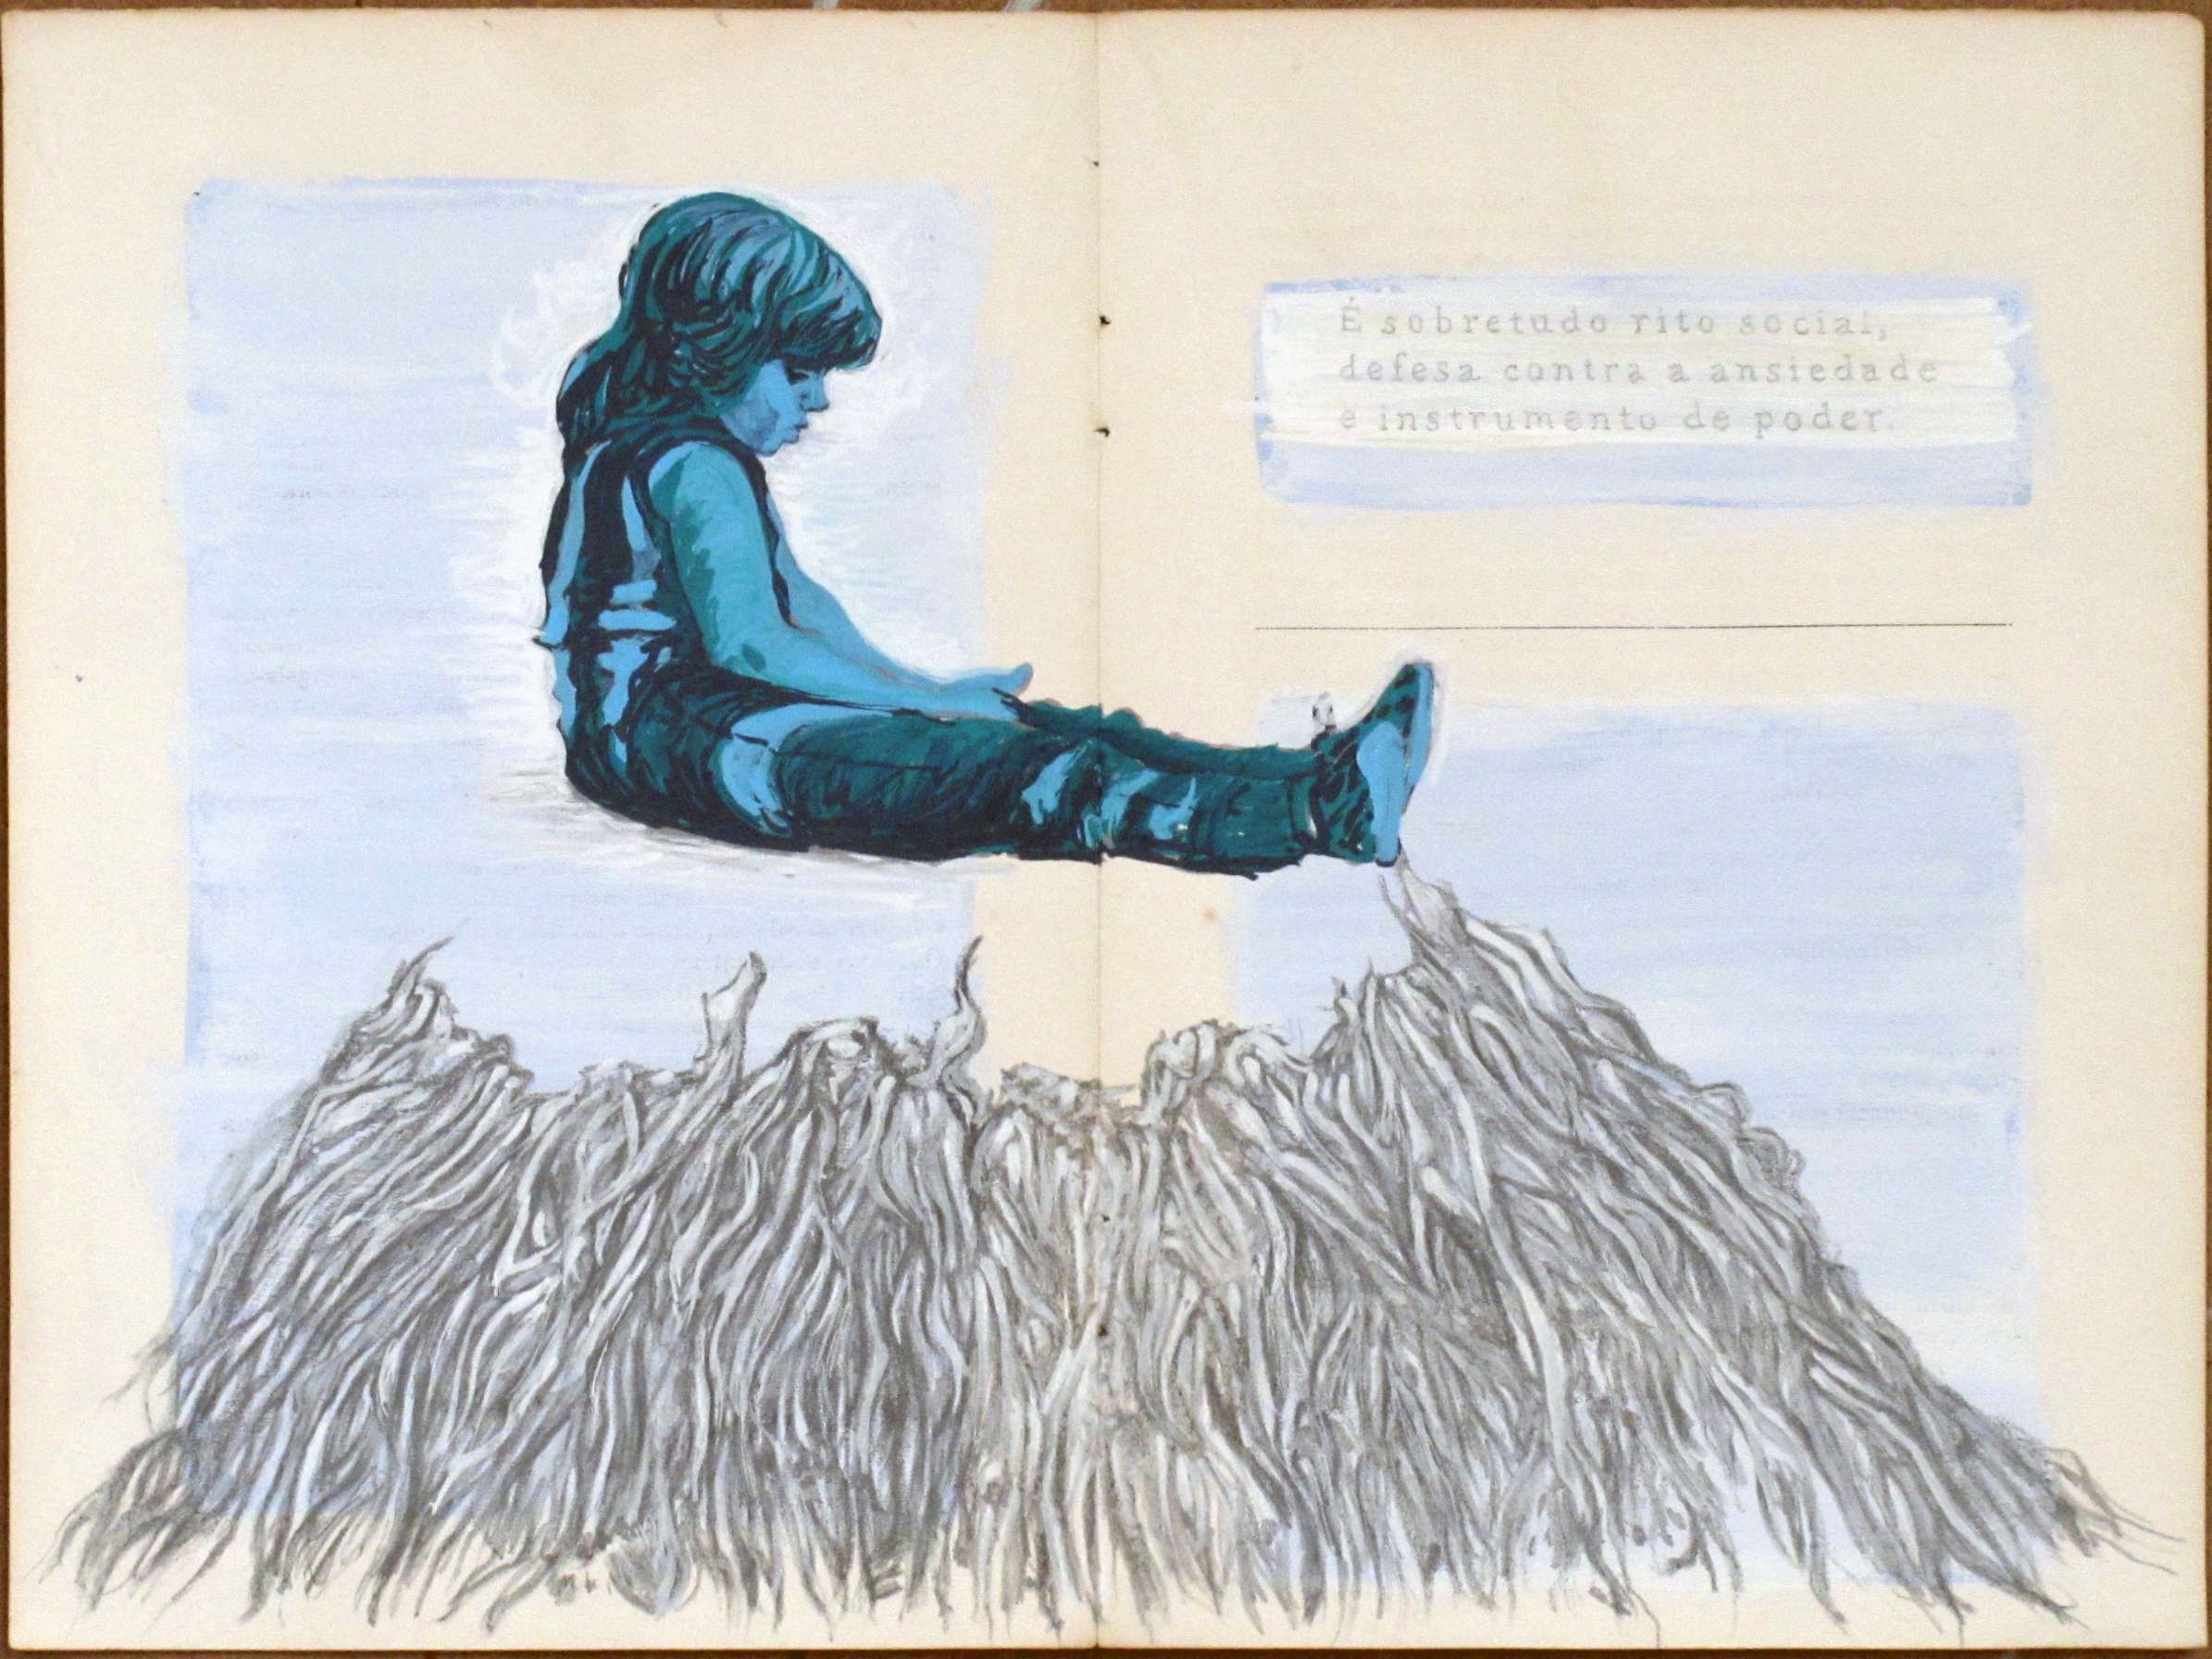 Vernacular Series – Open Book by Teresa Berlinck